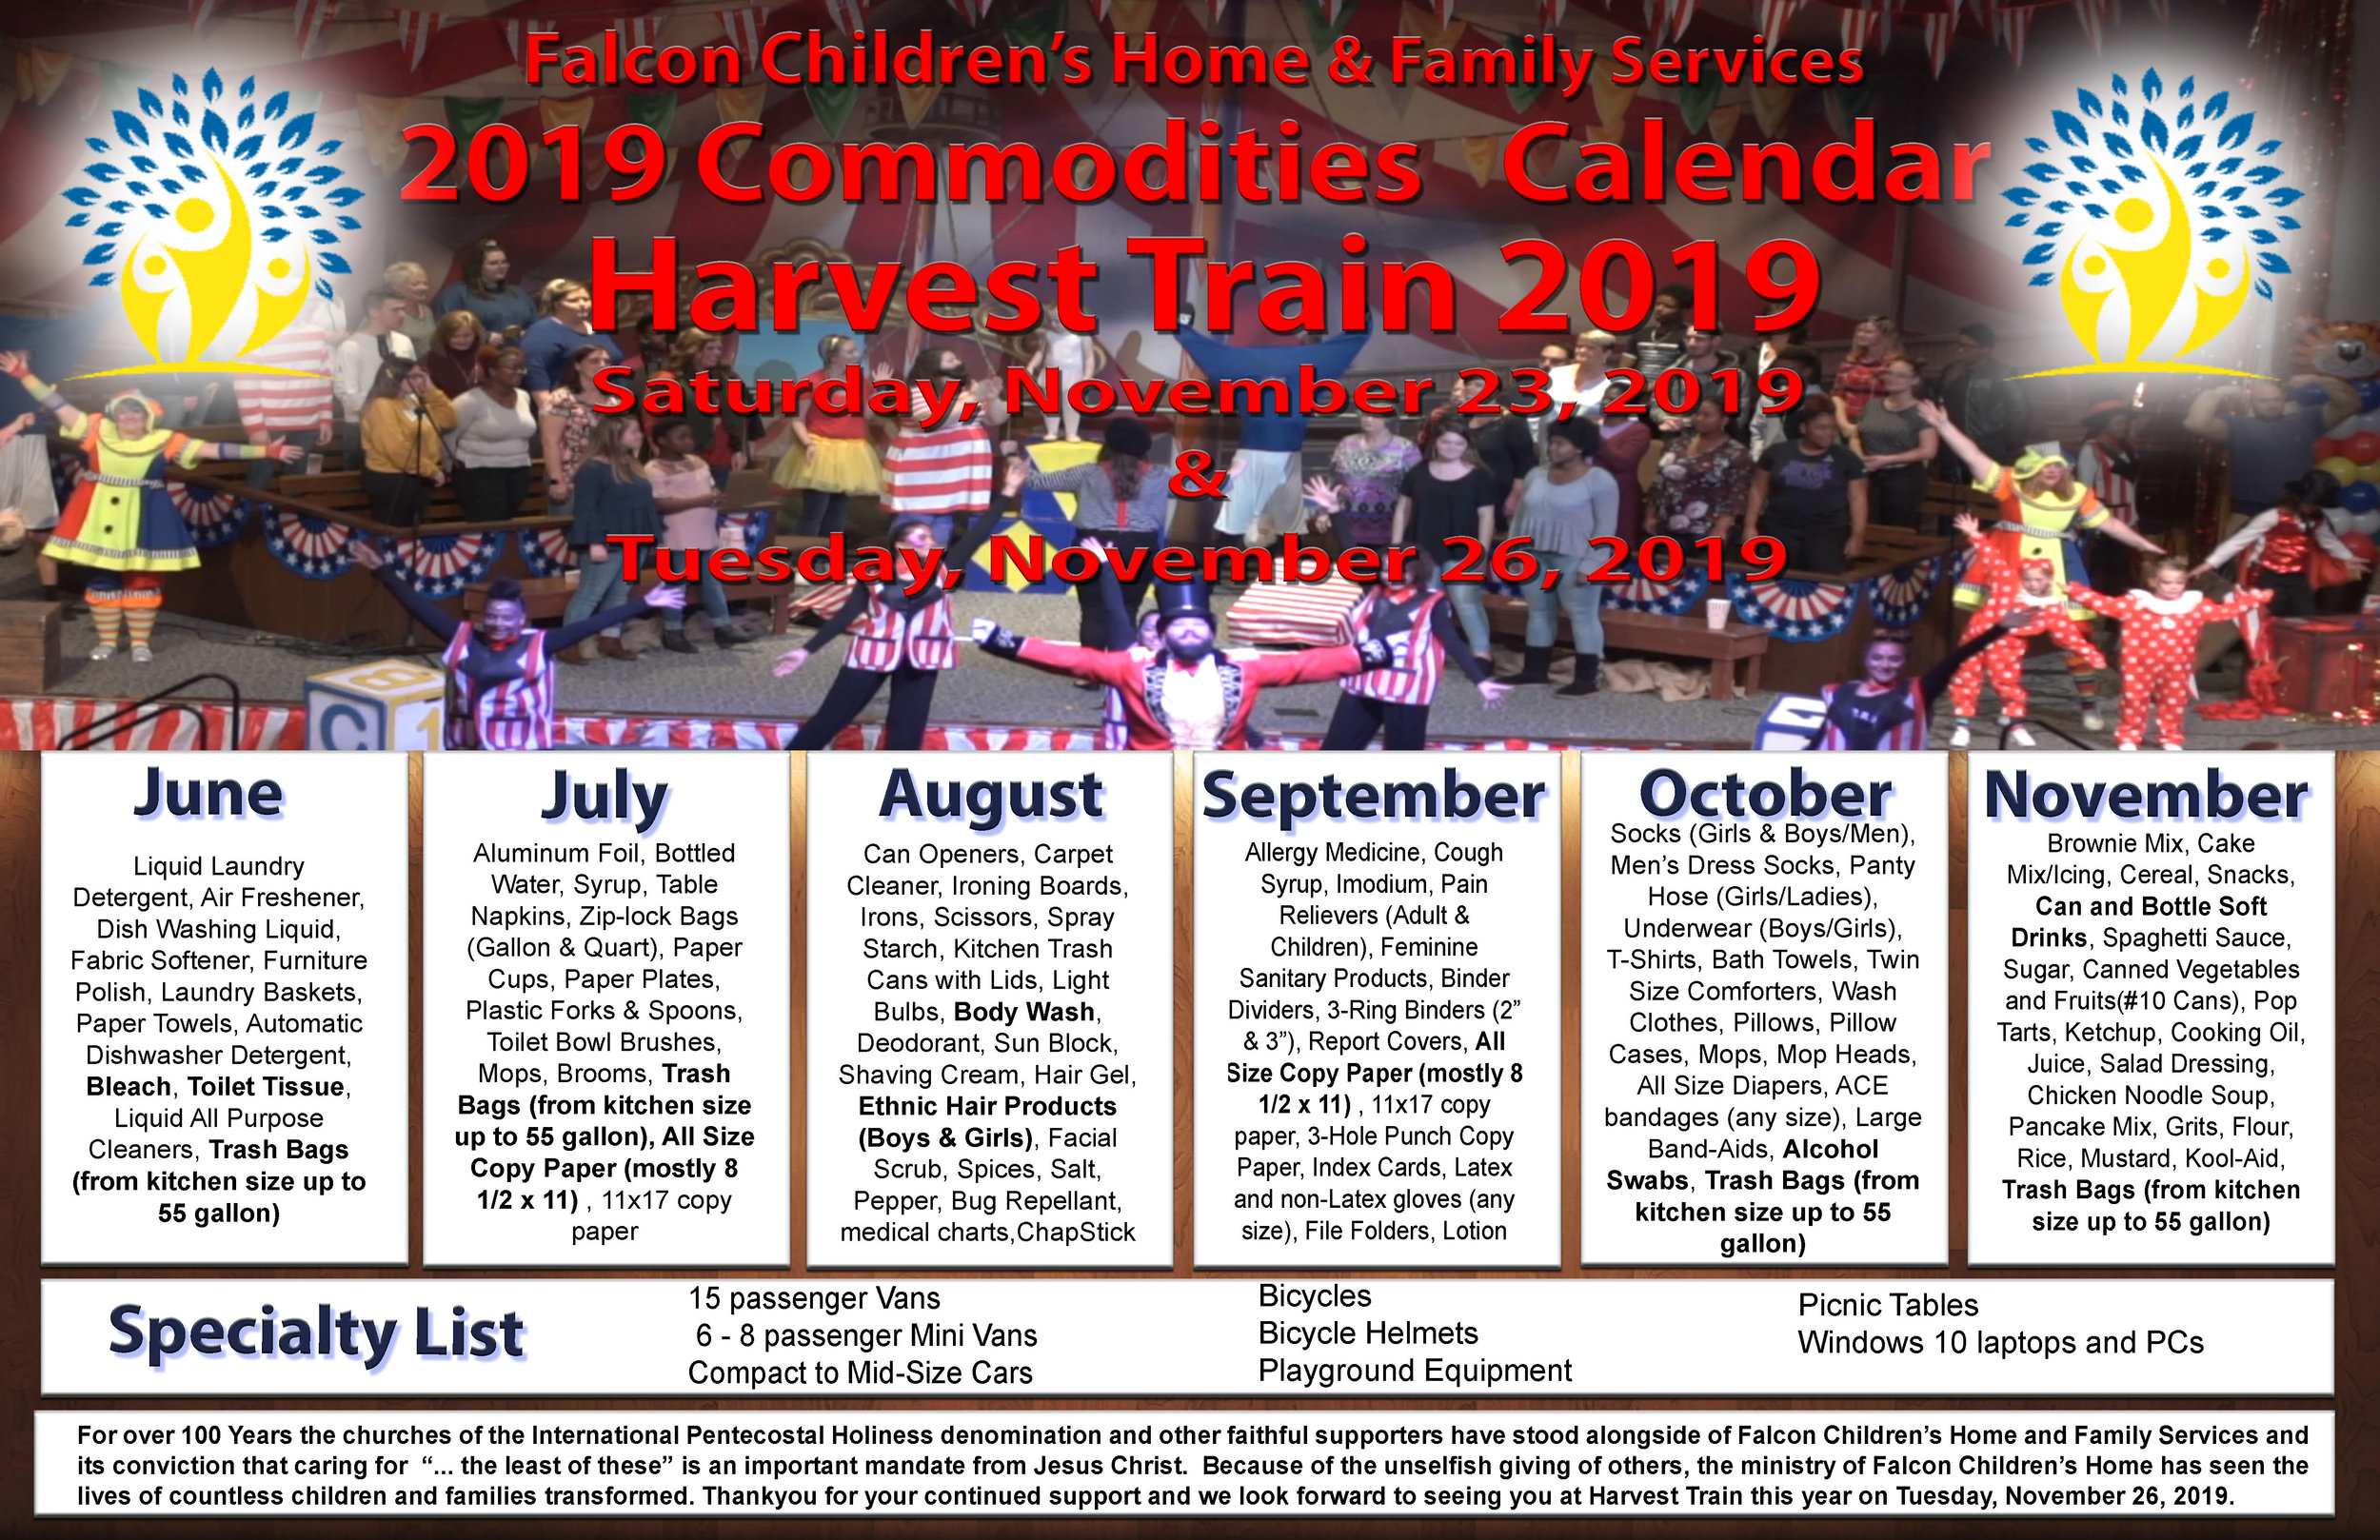 2019 Commodities Calendar.jpg